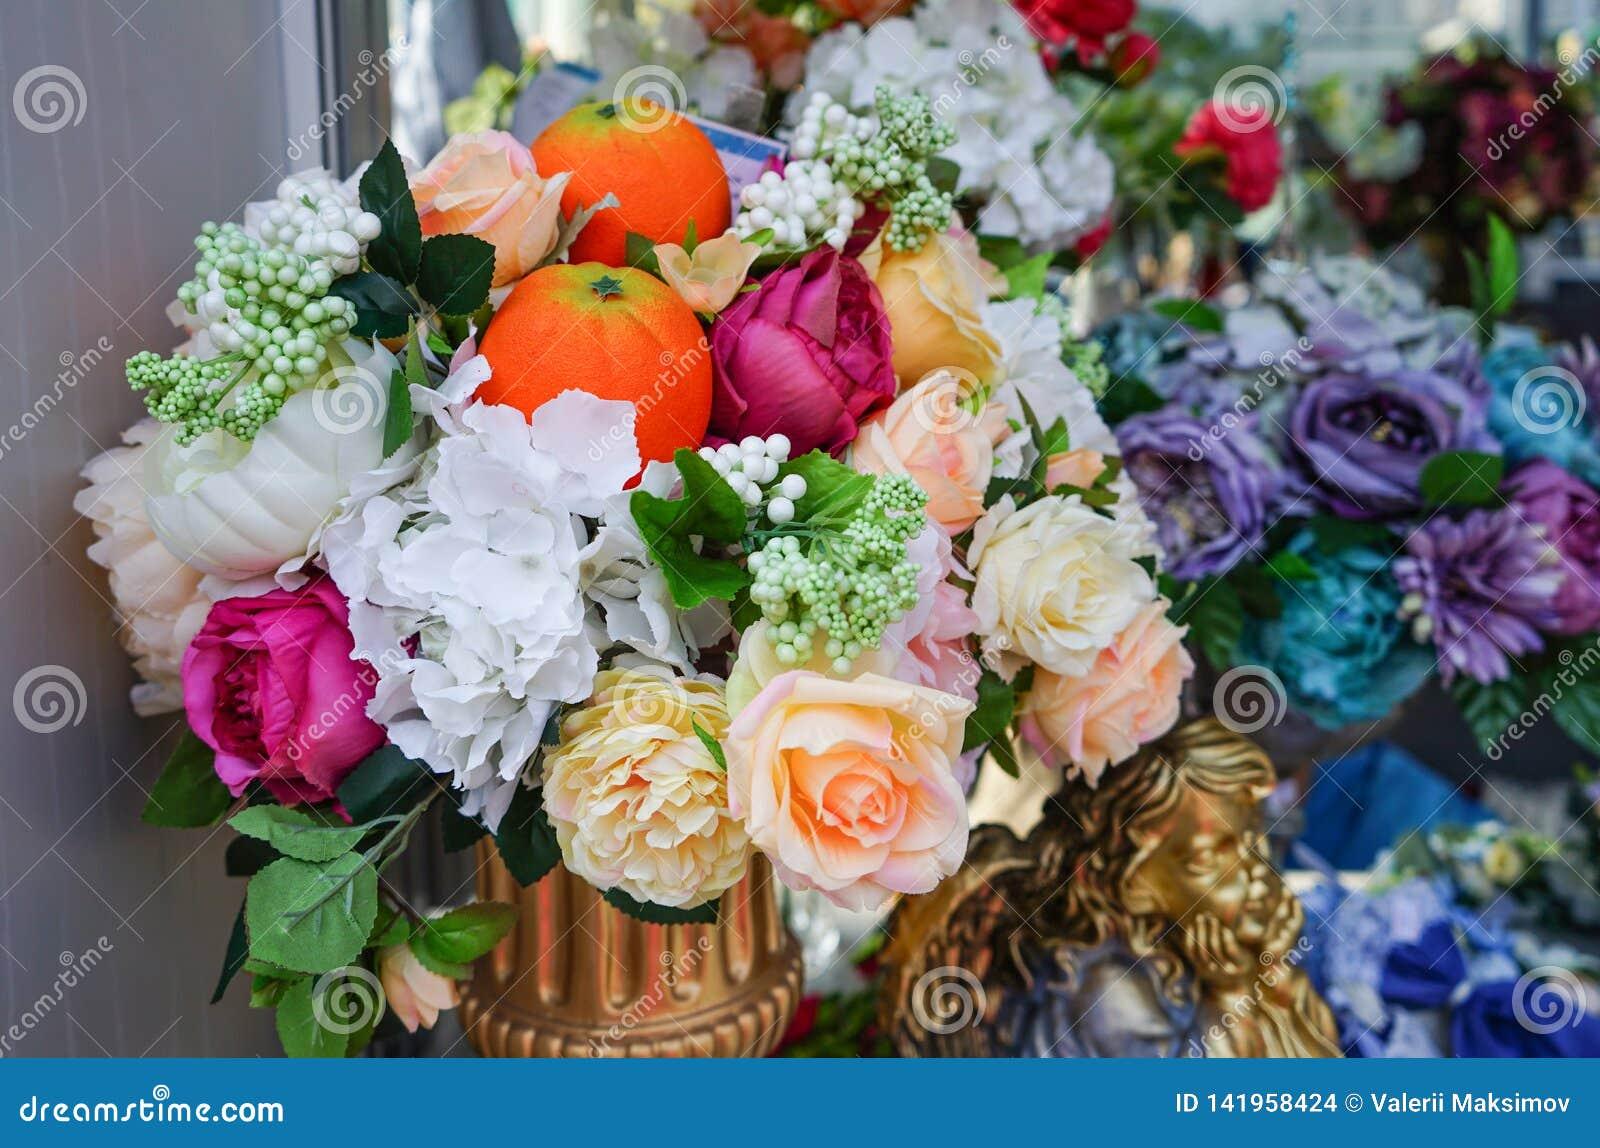 Flower arrangement of artificial flowers and oranges